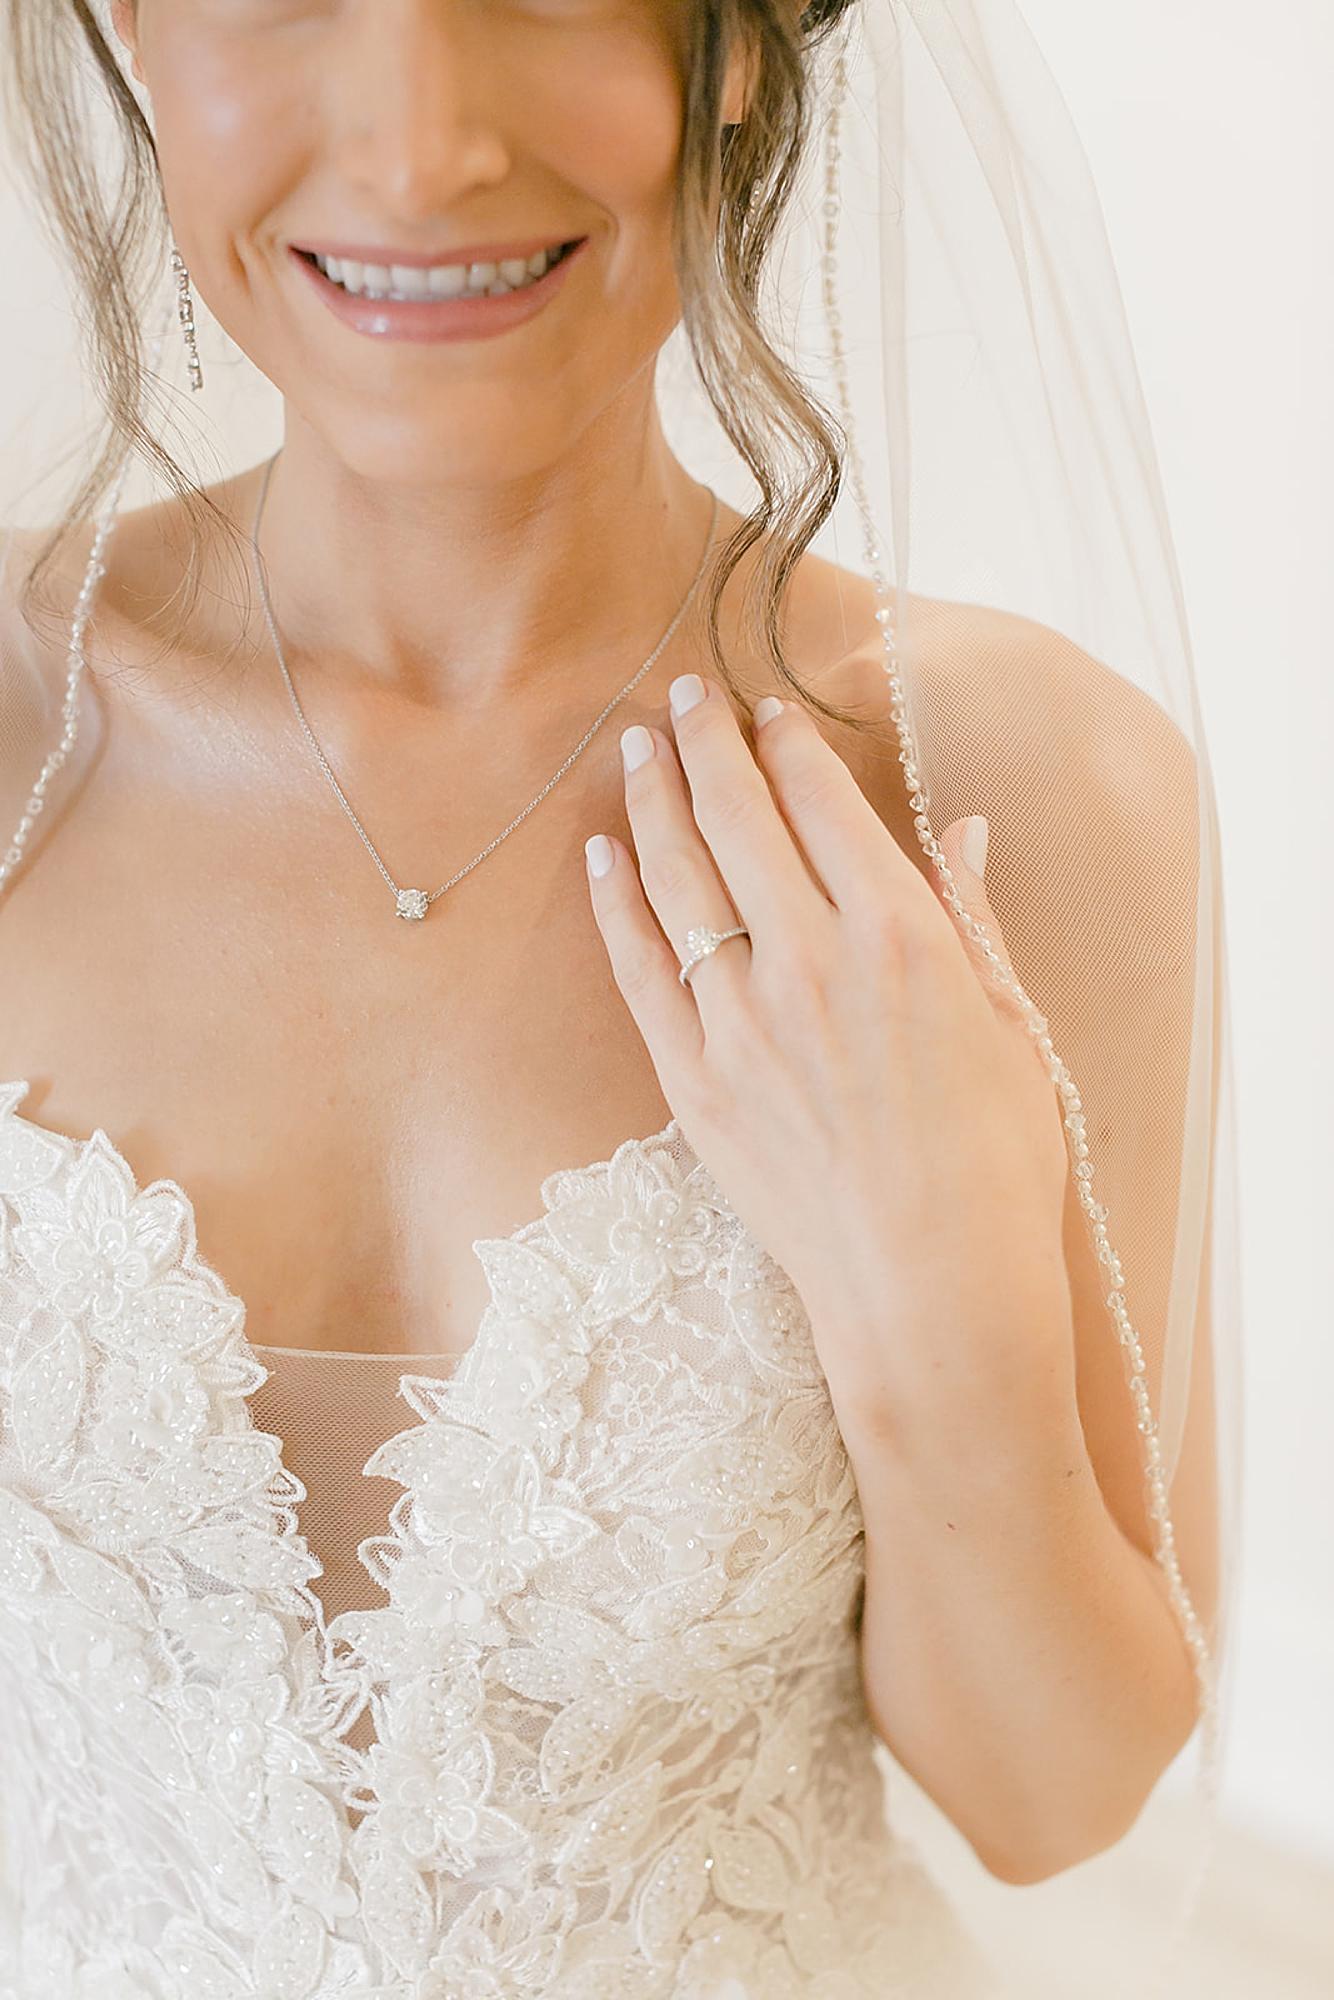 Linwood Country Club Wedding Photography by Magdalena Studios KatieTom0015